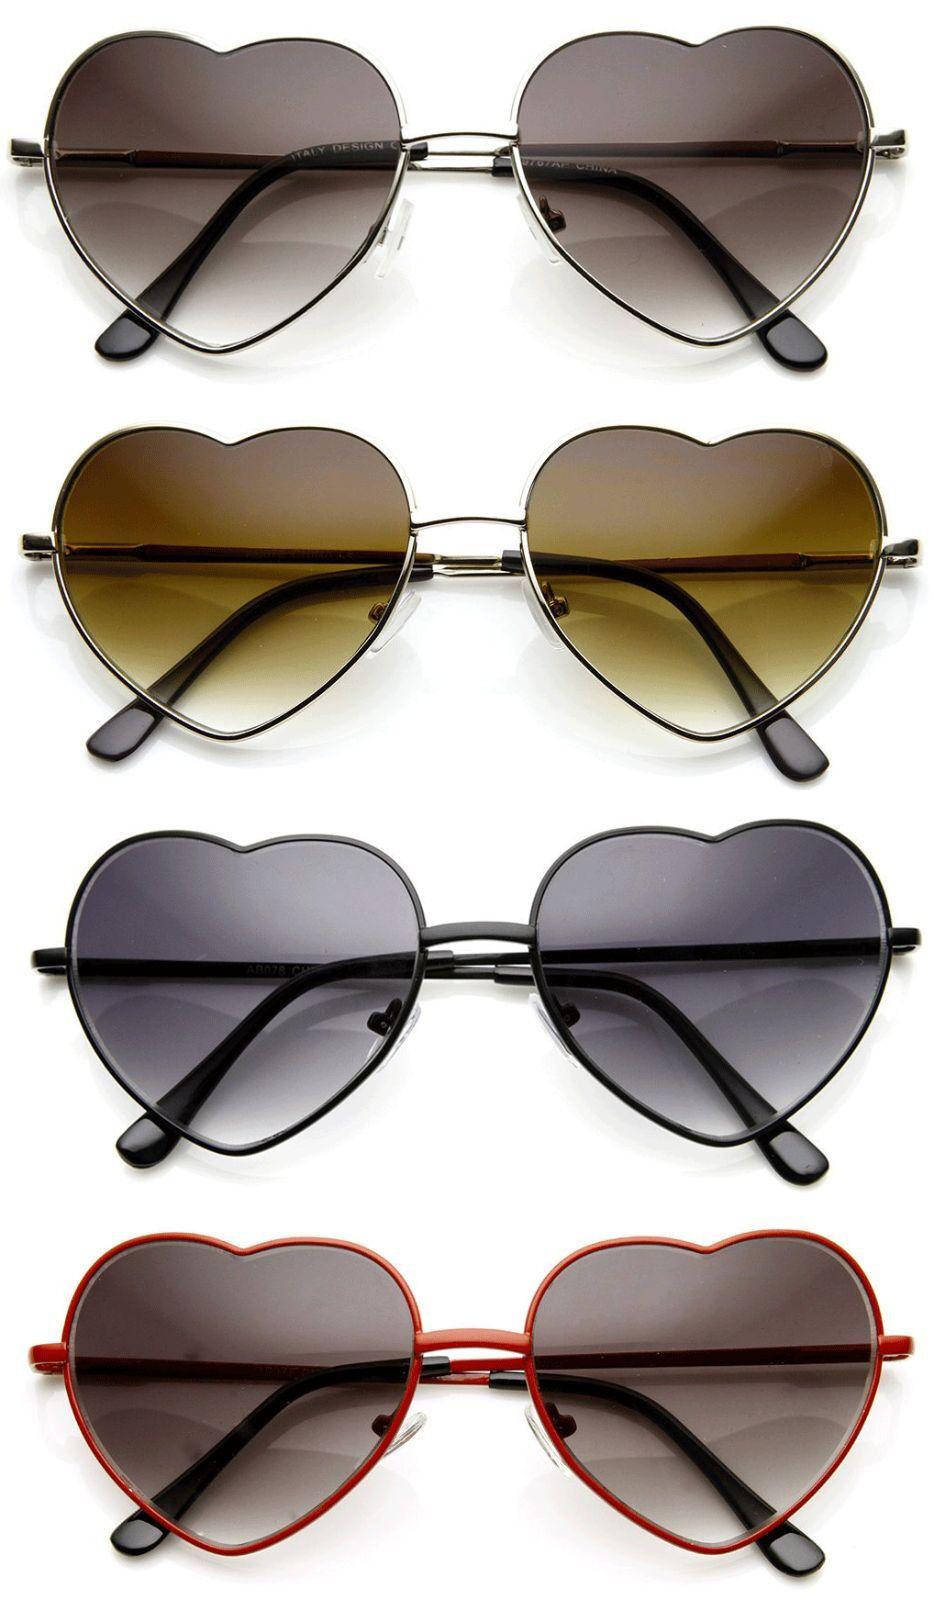 8f01479b10 Details about Vintage Retro Fashion Lolita Heart Shaped Aviator Metal Frame  Women Sunglasses